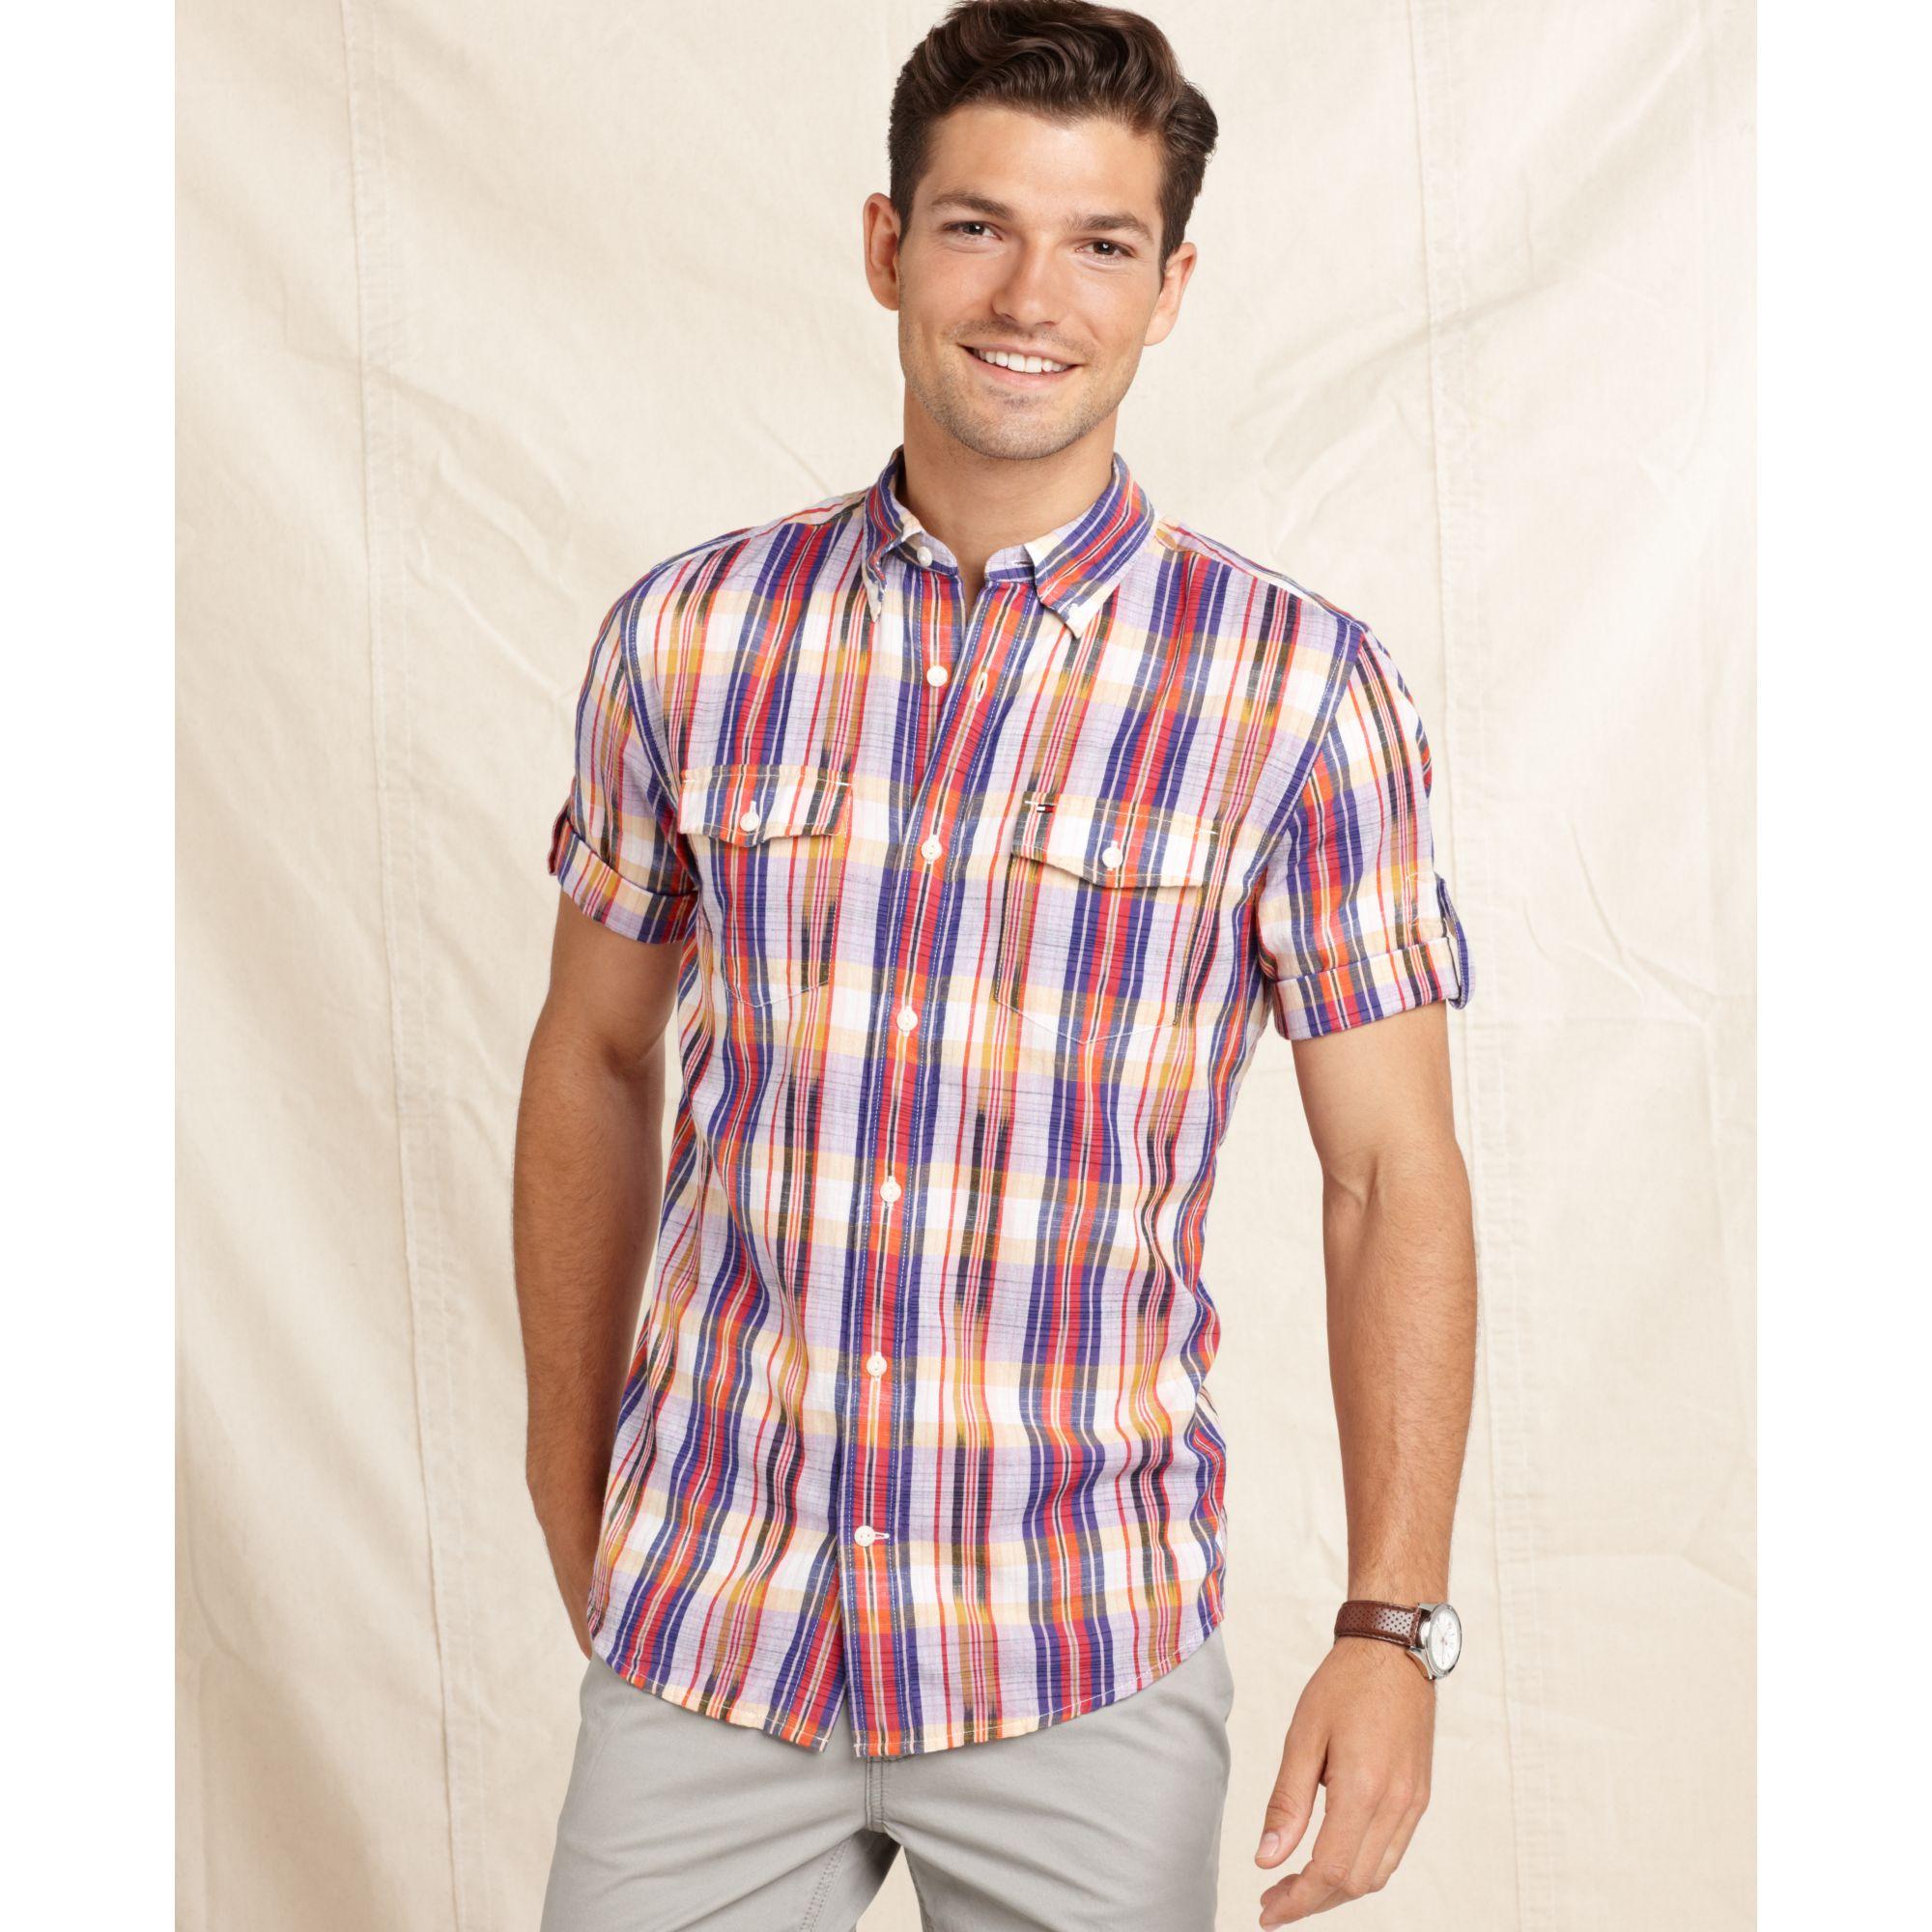 Tommy Hilfiger Slimfit Short Sleeve Gideon Shirt In Purple